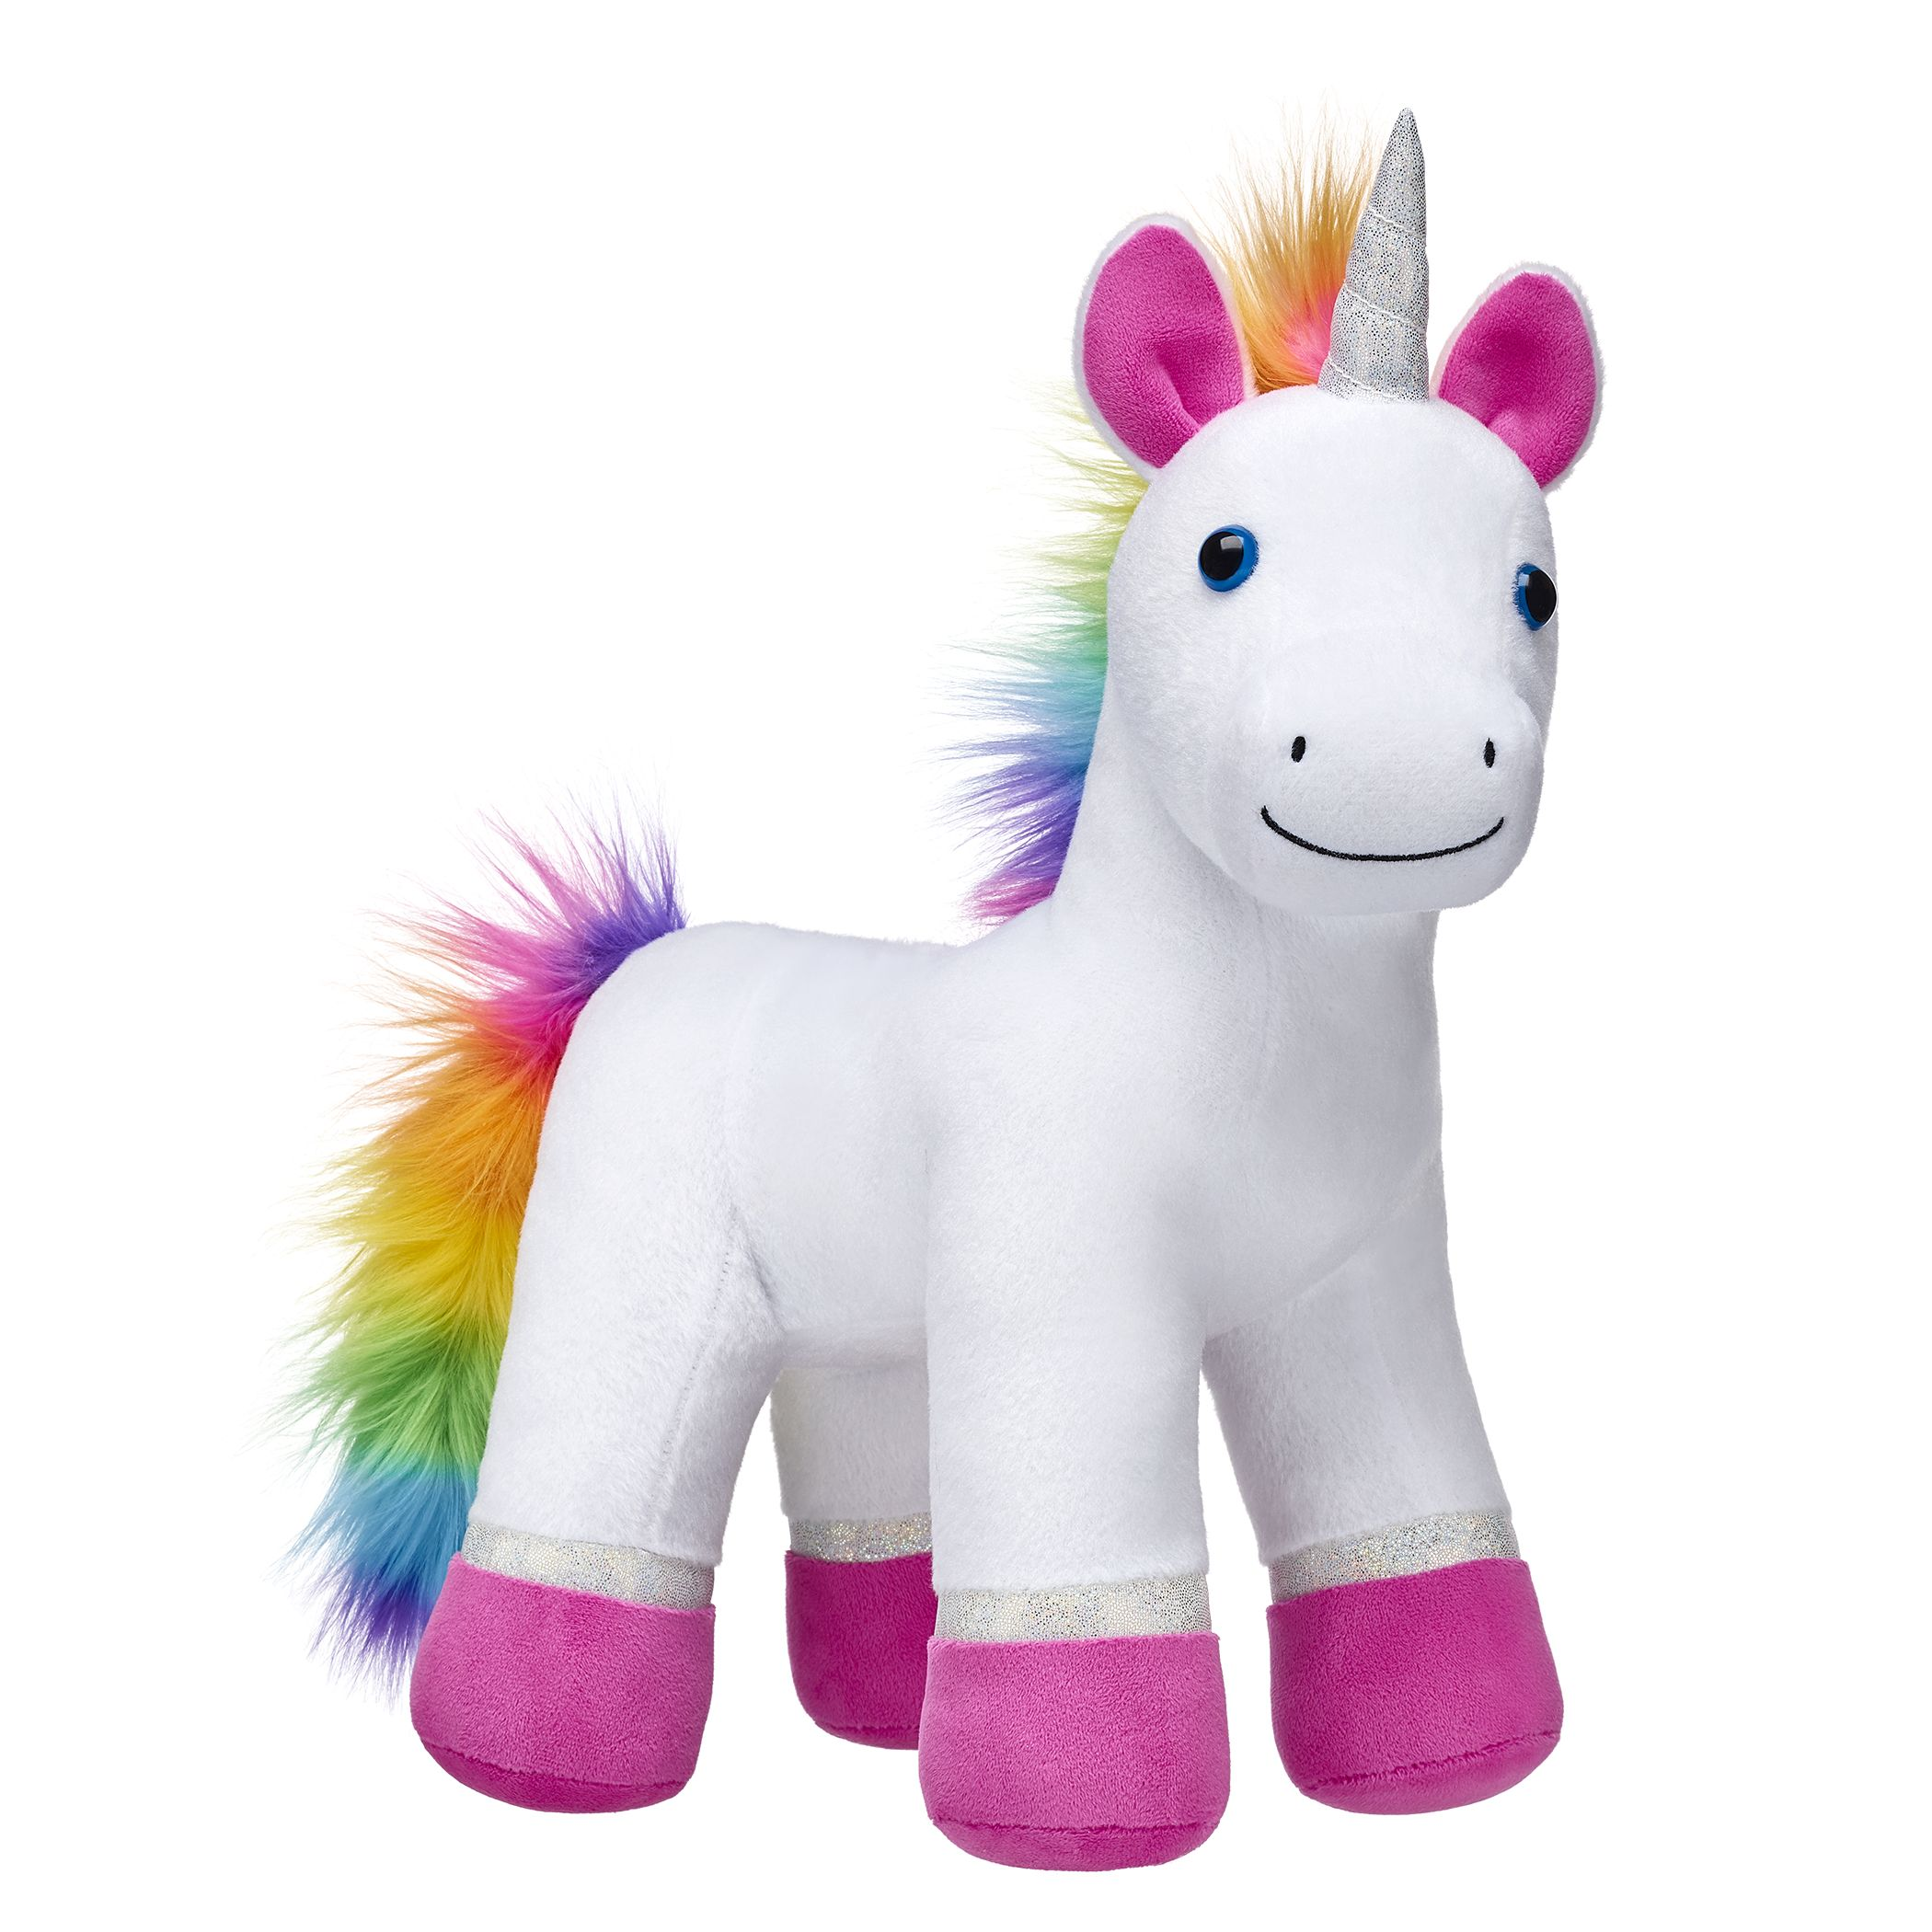 Color Craze Unicorn Unicorn stuffed animal plush